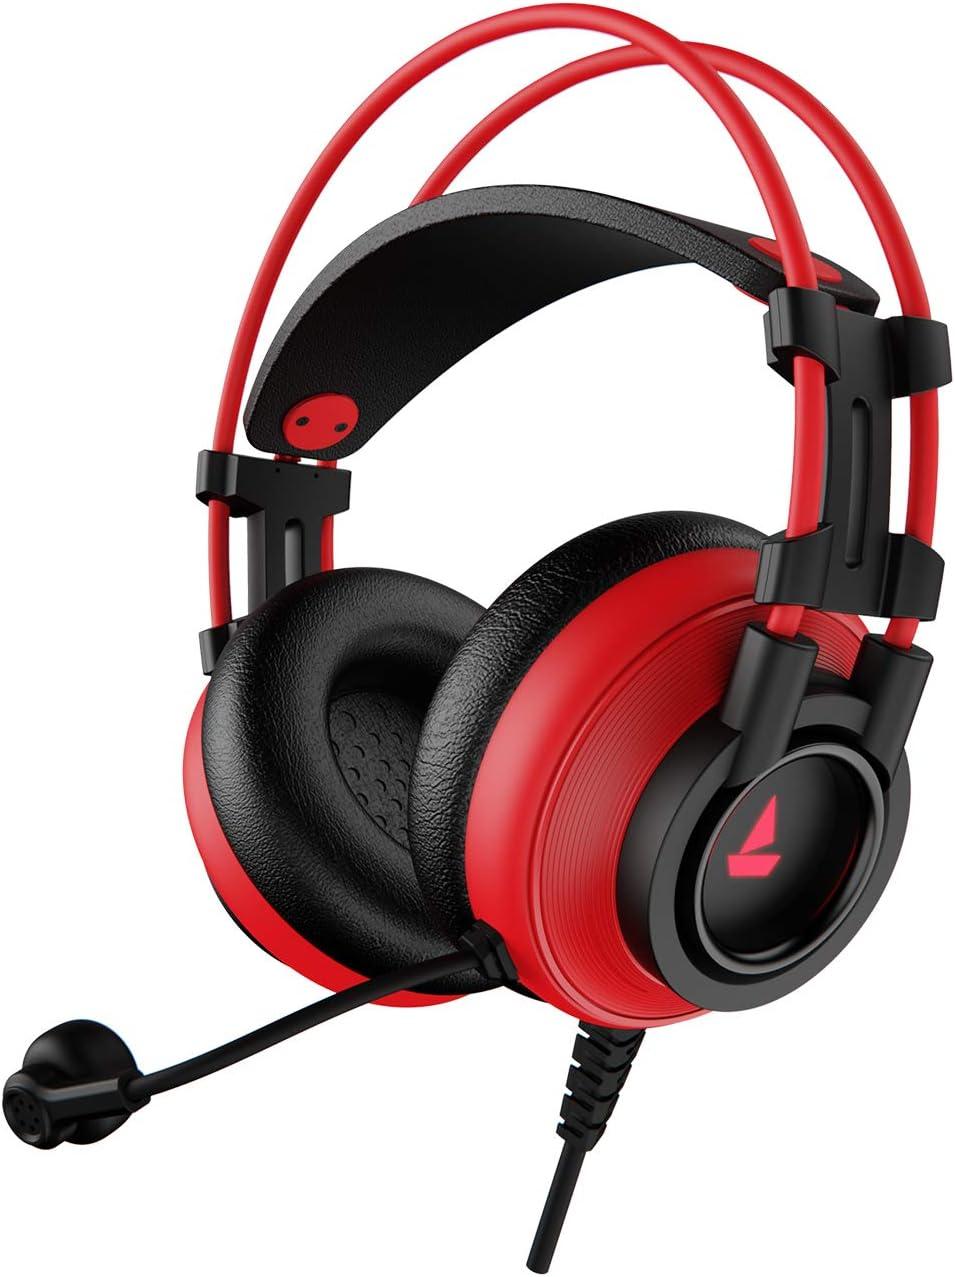 Boat Immortal IM-200 Gaming Headphones: Price, Specs, Launch Date